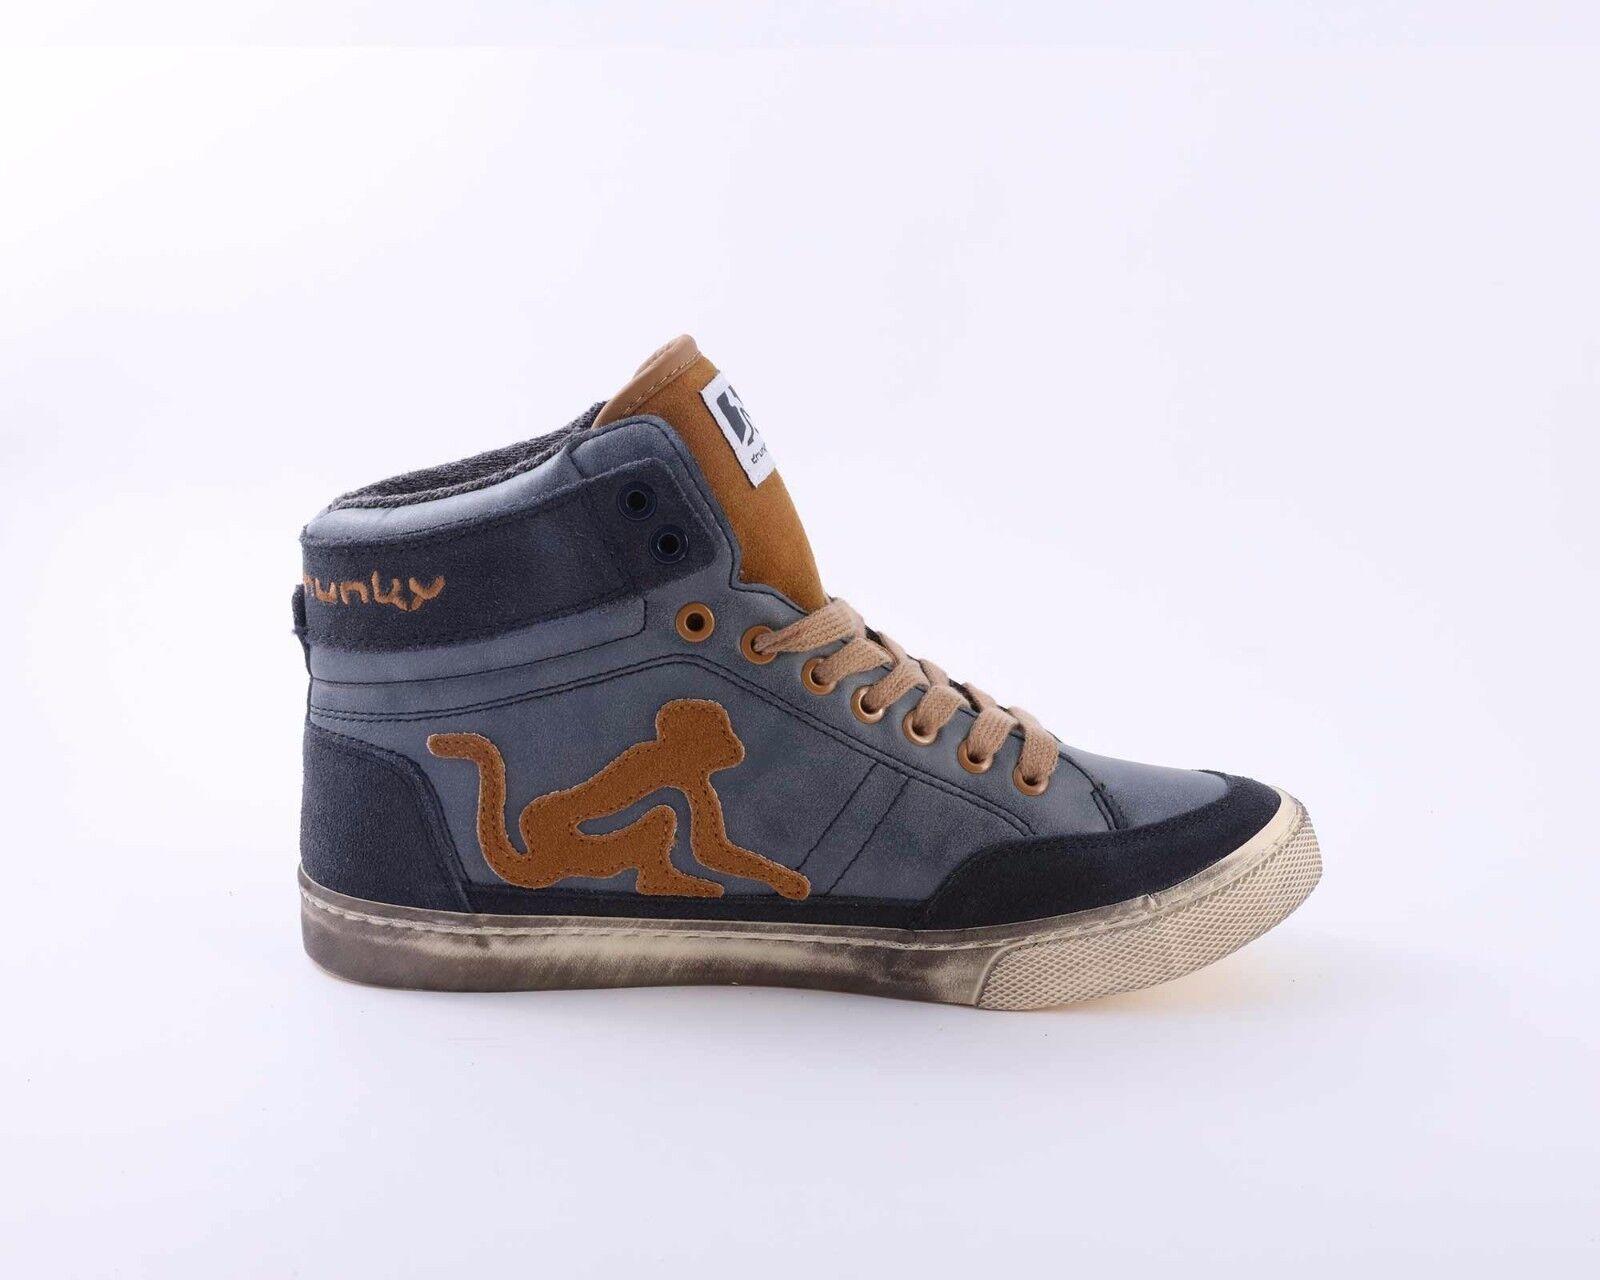 84,90 -20 DRUNKNMUNKY Chaussures SNEAKERS ALTE BOSTON VITAMINIX VINTAGE INVERNO